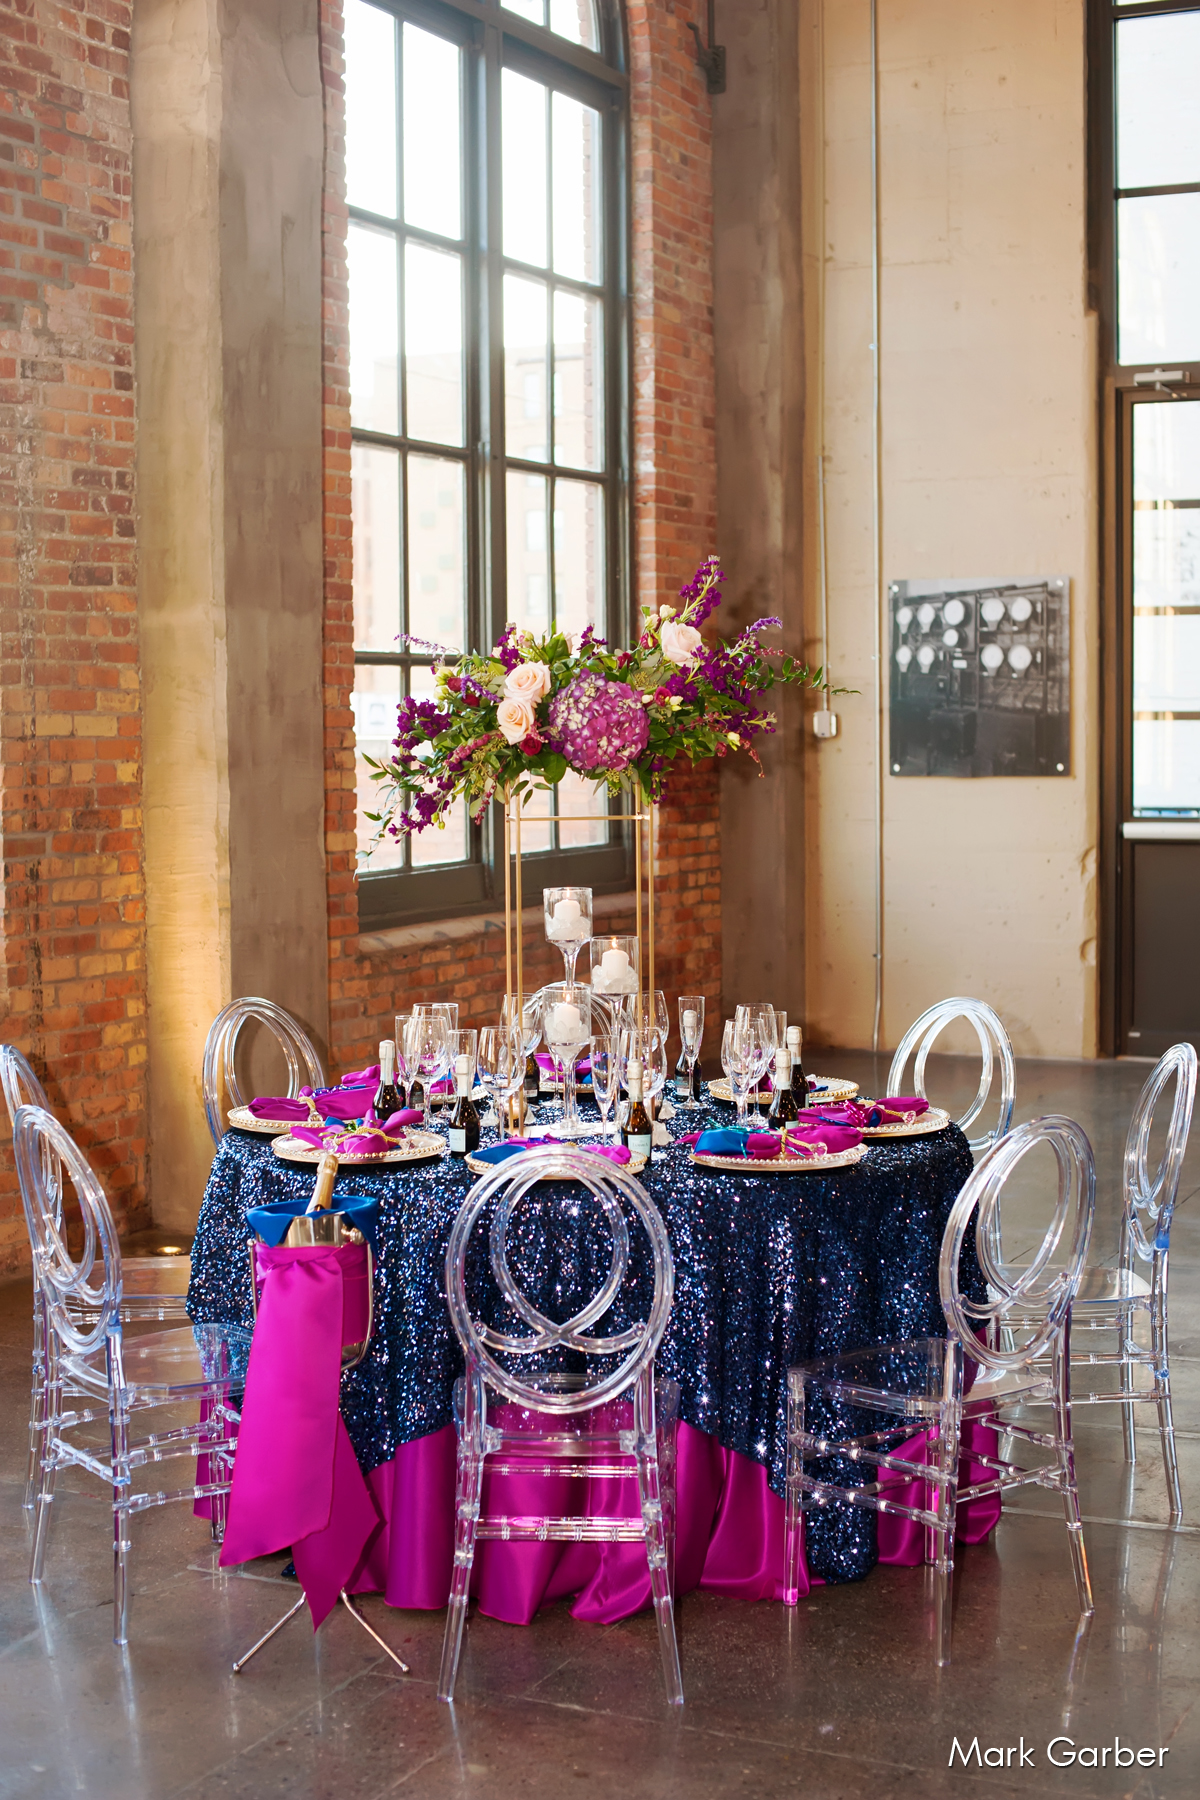 steam-plant-dayton-wedding-event-venue-elite-catering-mark-garber_003.jpg